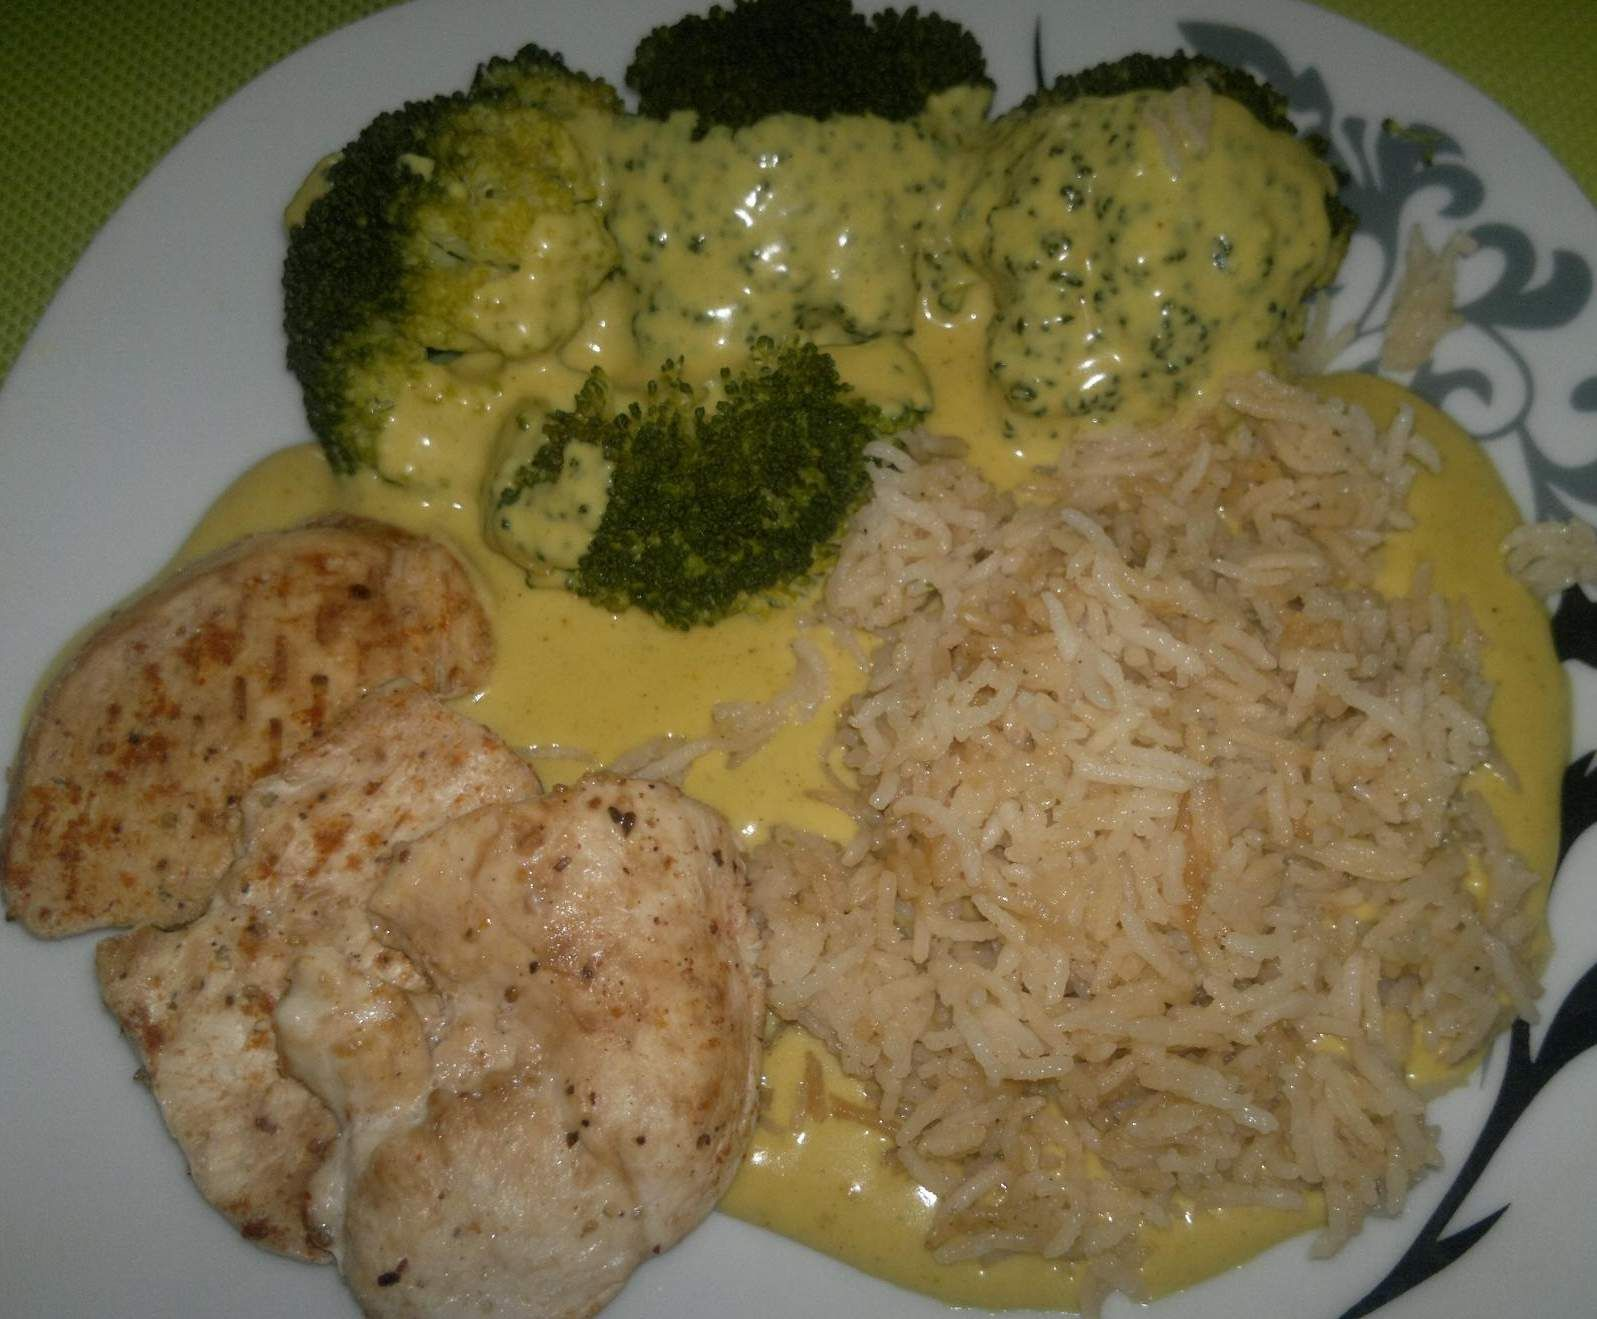 all in one reis broccoli h hnchen ministeaks mit currysauce rezept yenecekler pinterest. Black Bedroom Furniture Sets. Home Design Ideas